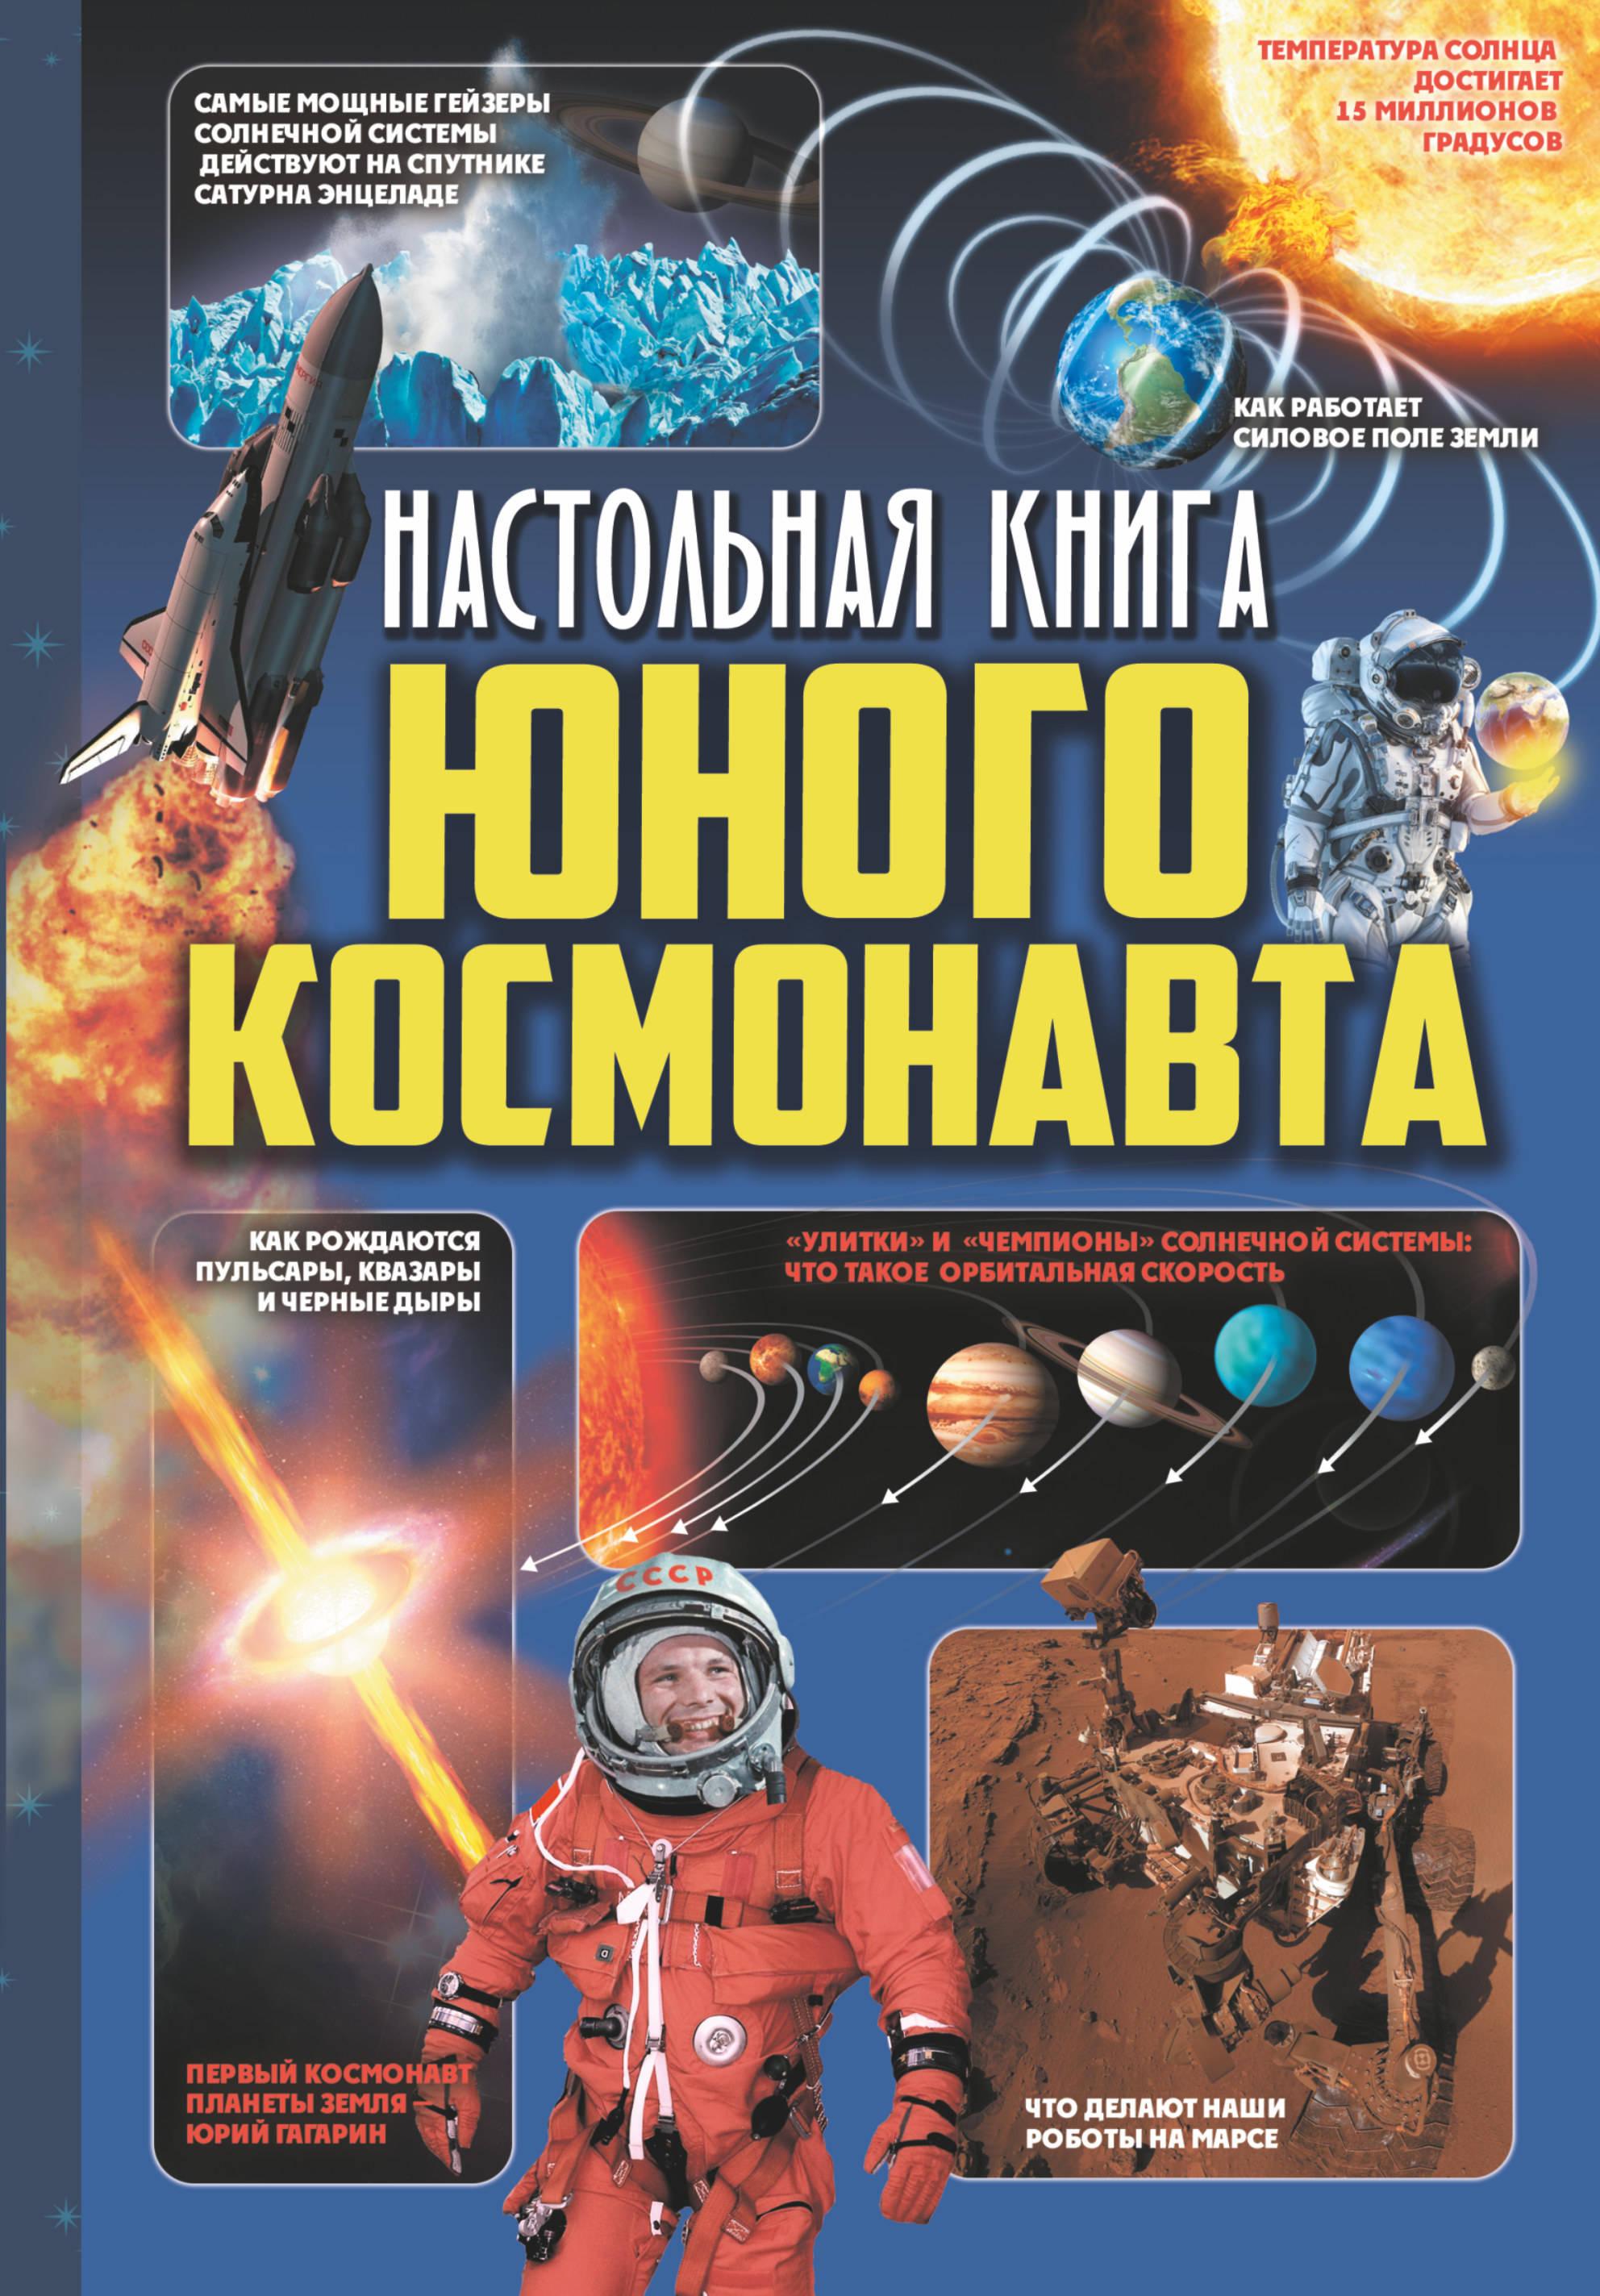 Кошевар Дмитрий Васильевич; Мороз Анна Ивановна Настольная книга юного космонавта